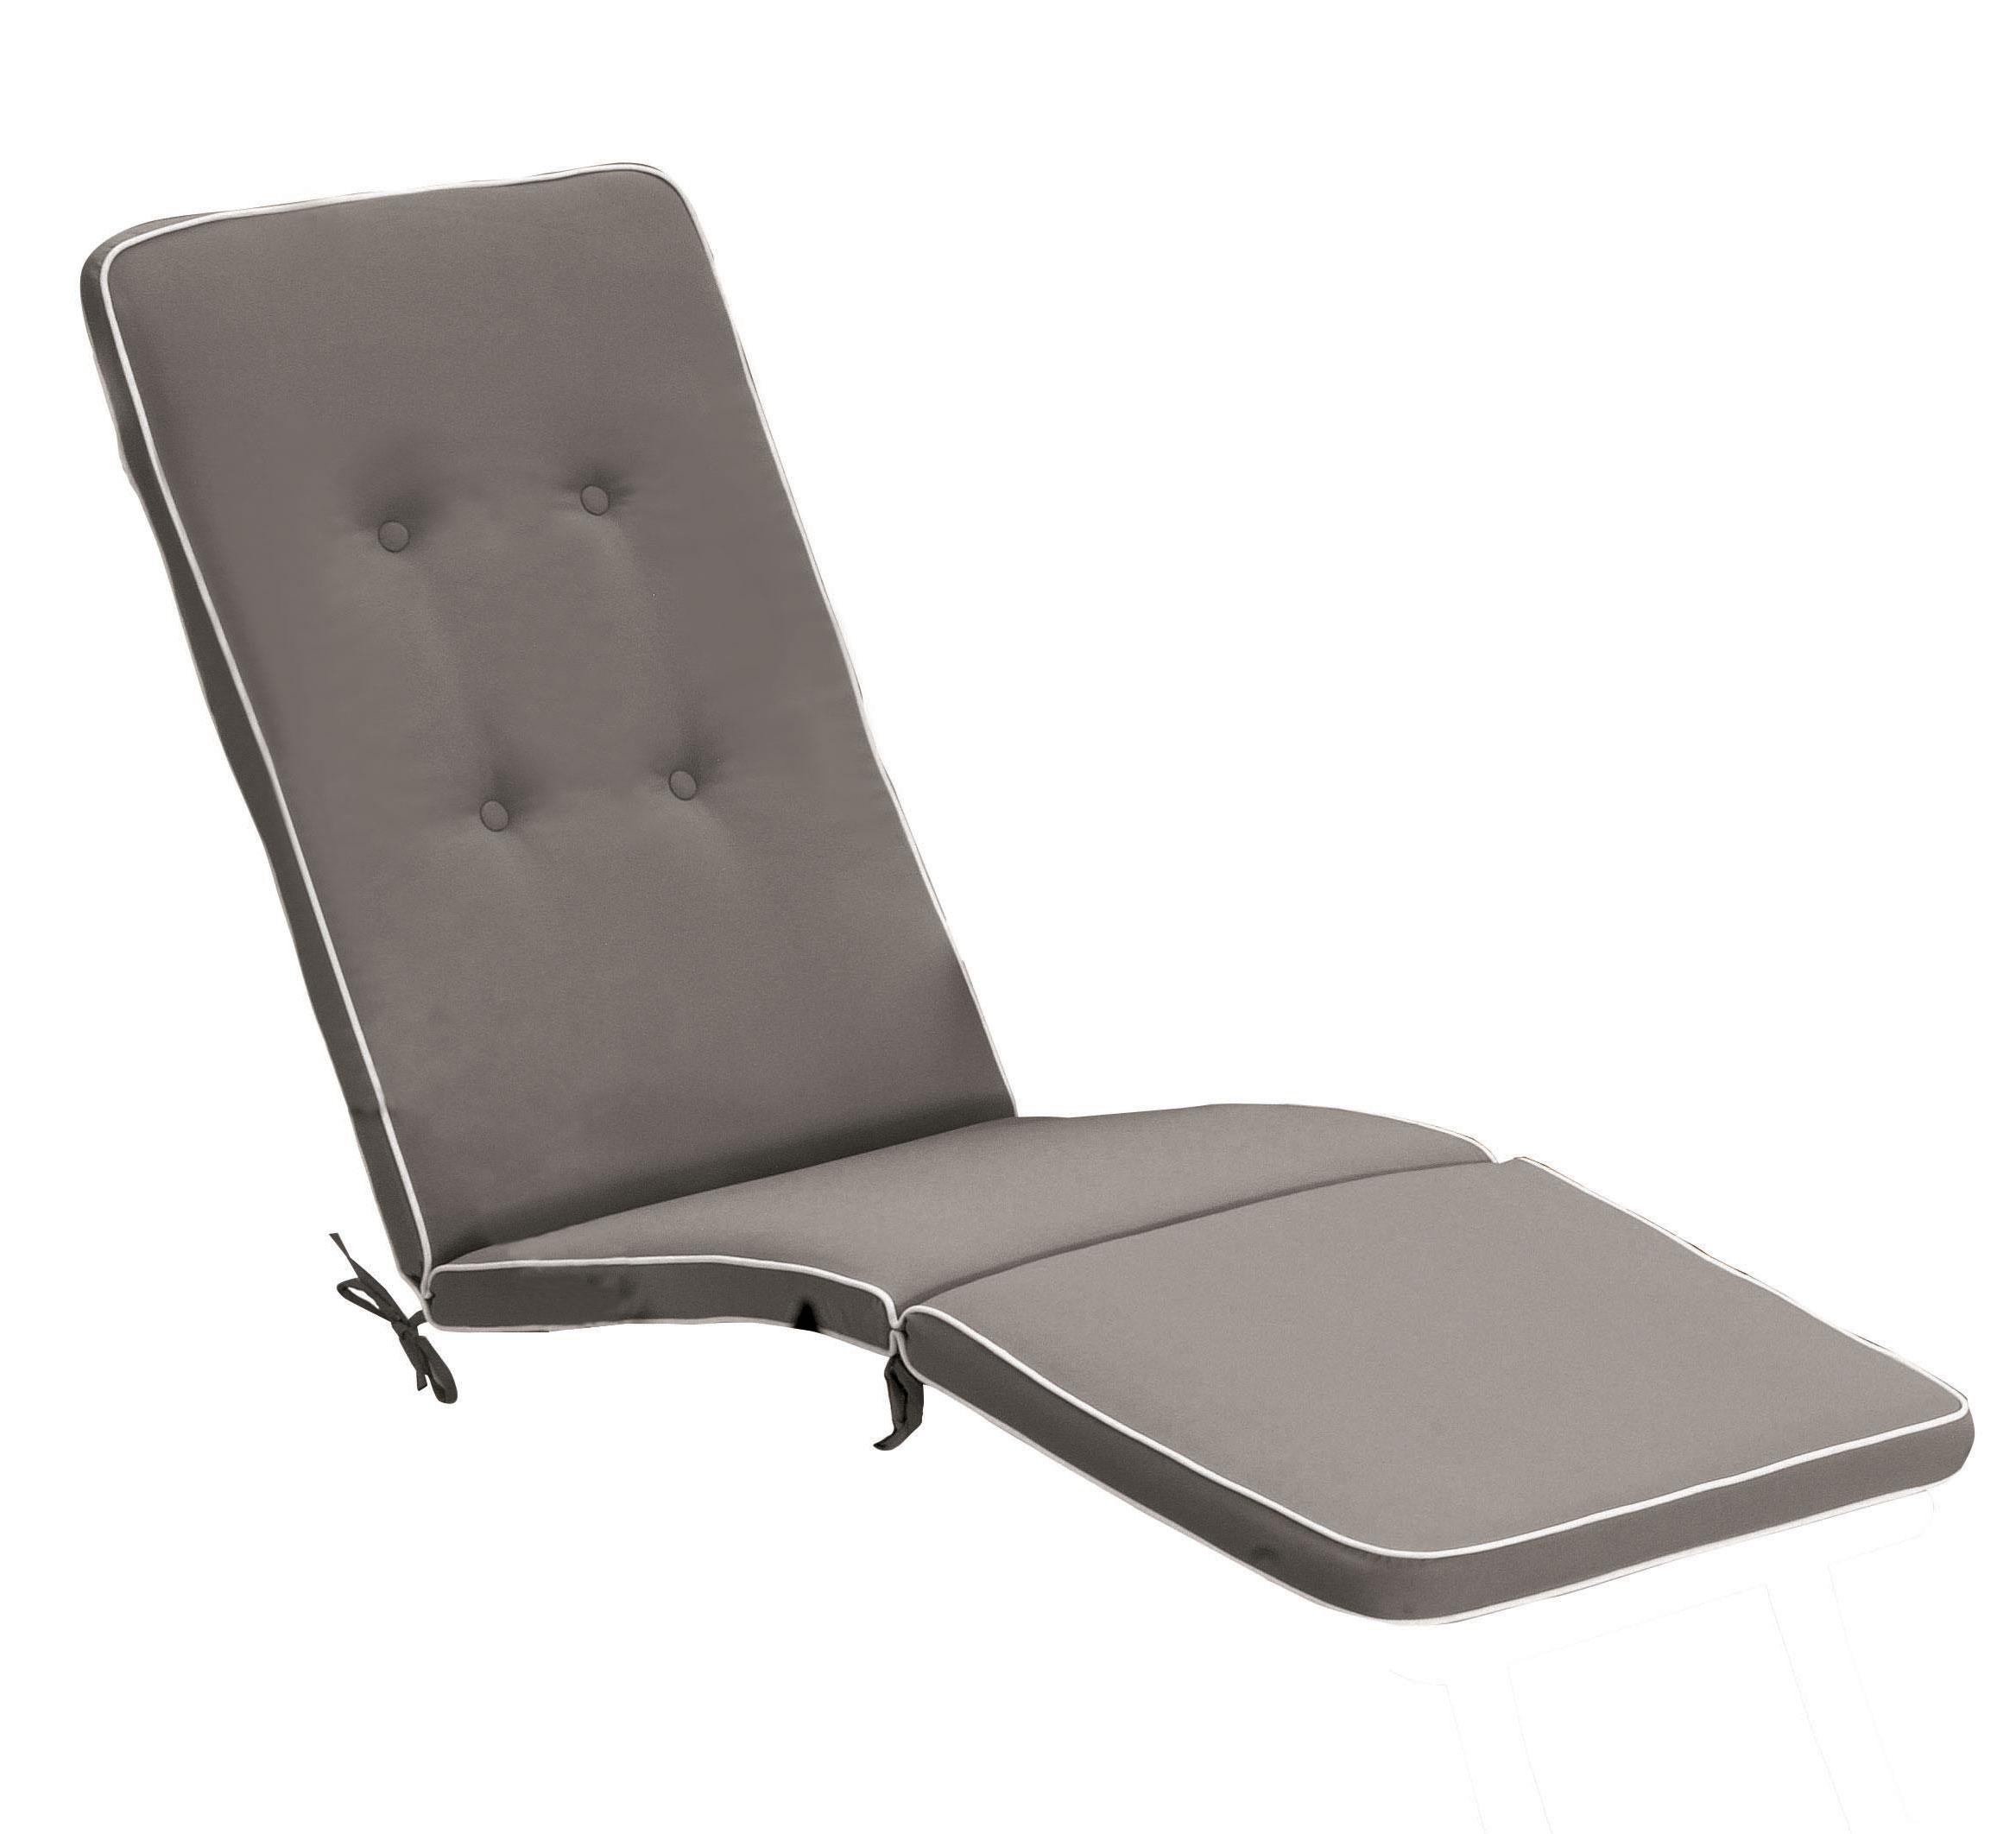 Cuscino per deckchair TORTORA